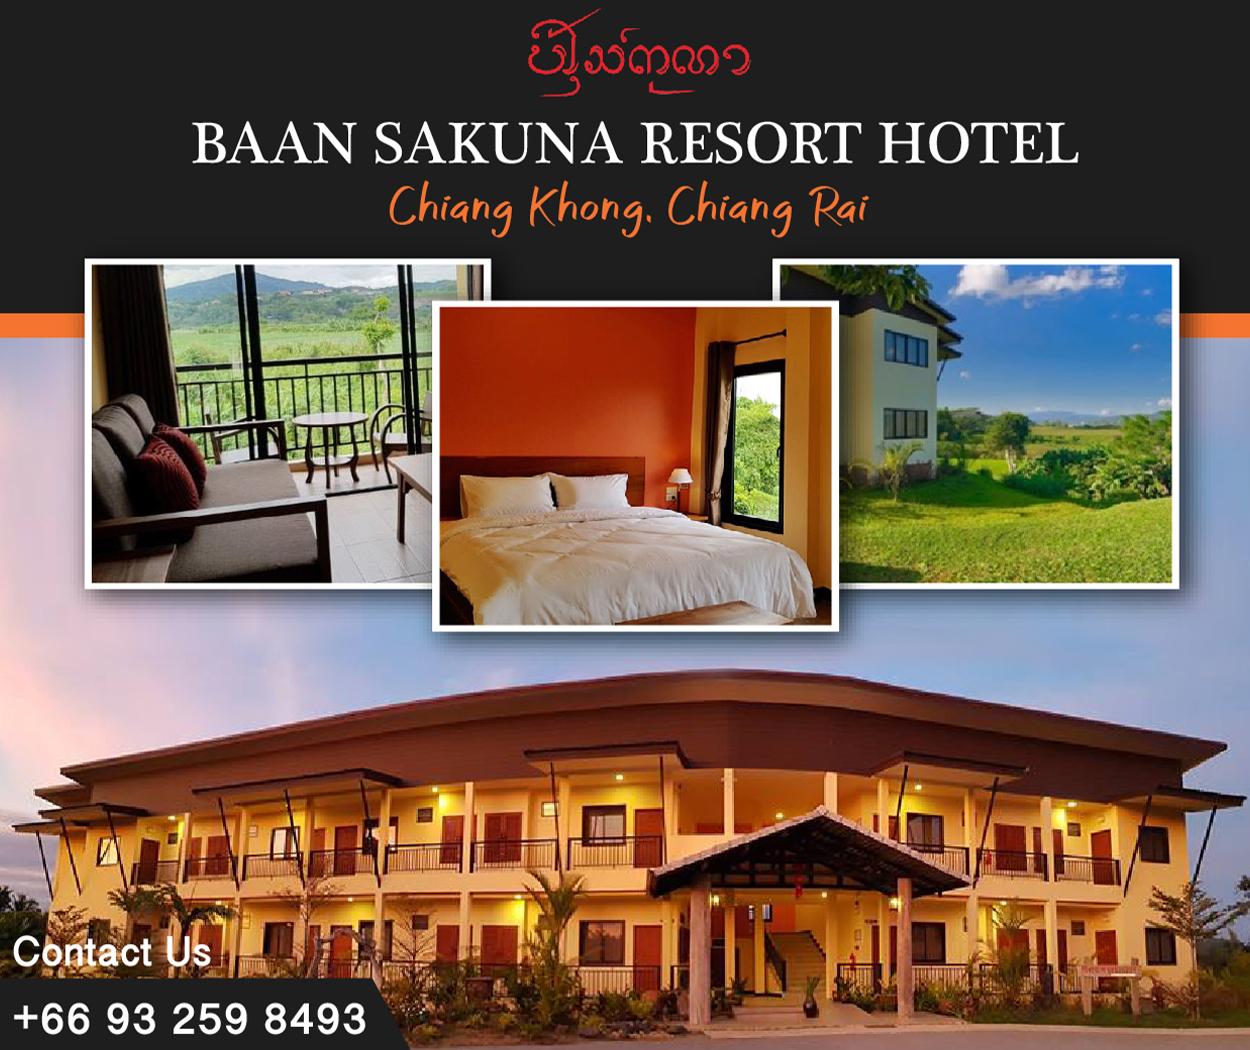 Baan Sakuna Resort & Hotel Chiang Rai (Features_Banner)